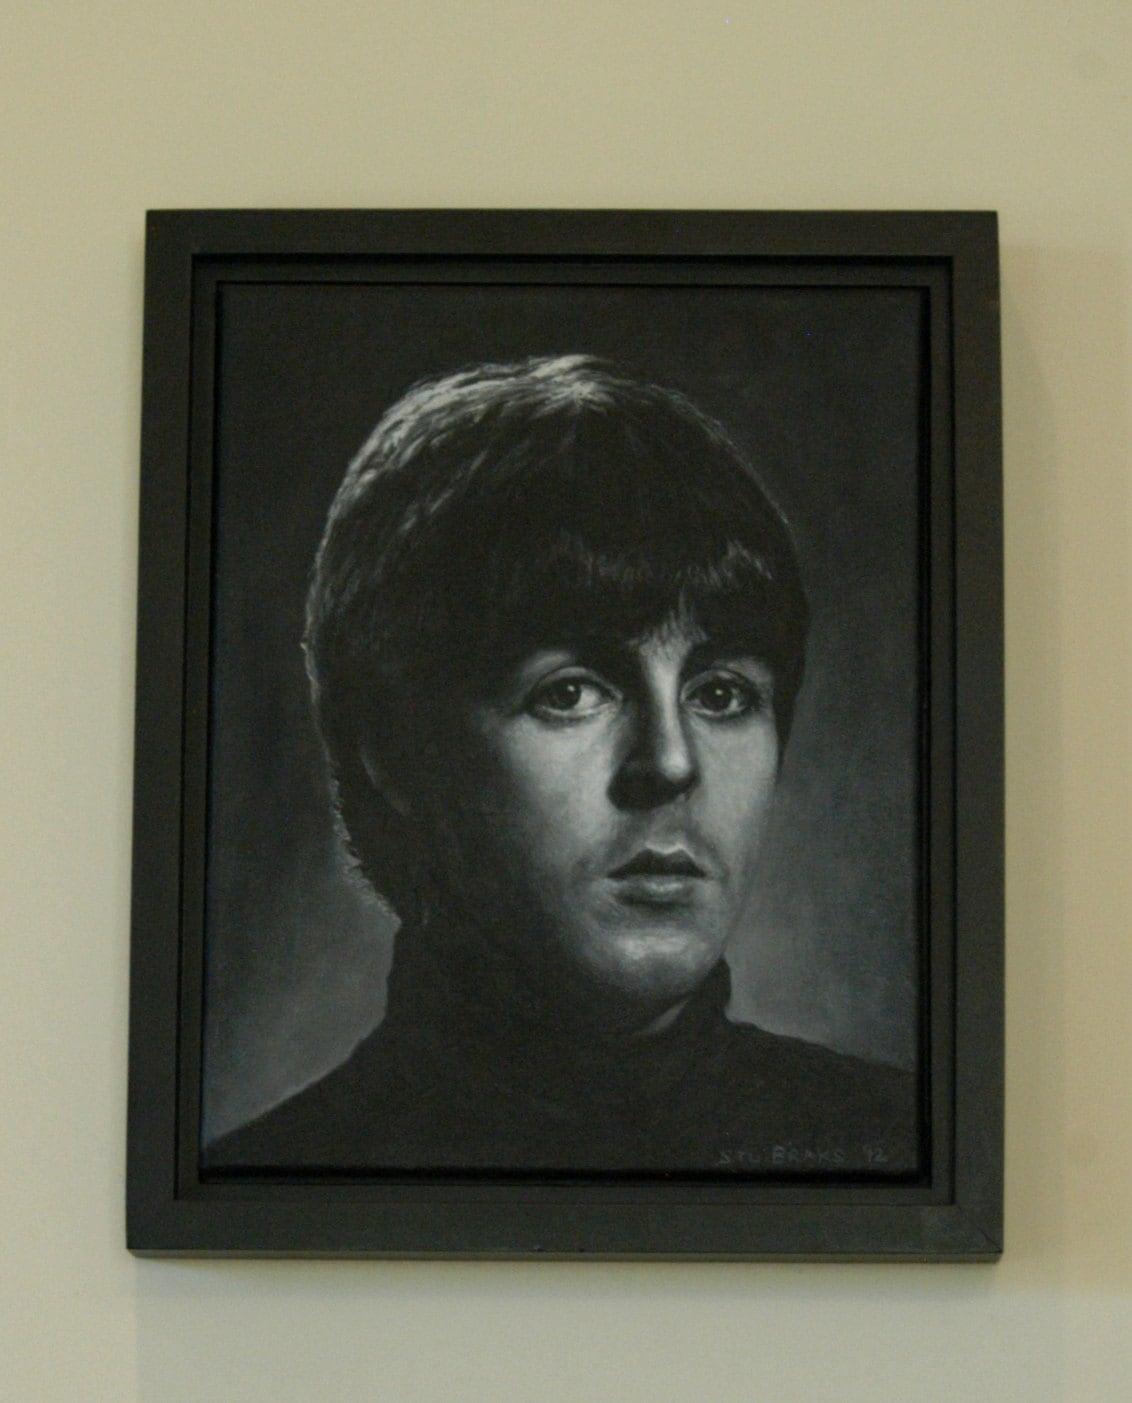 Original Gemälde auf Leinwand PAUL eingerahmt 16 x 13 Zoll | Etsy